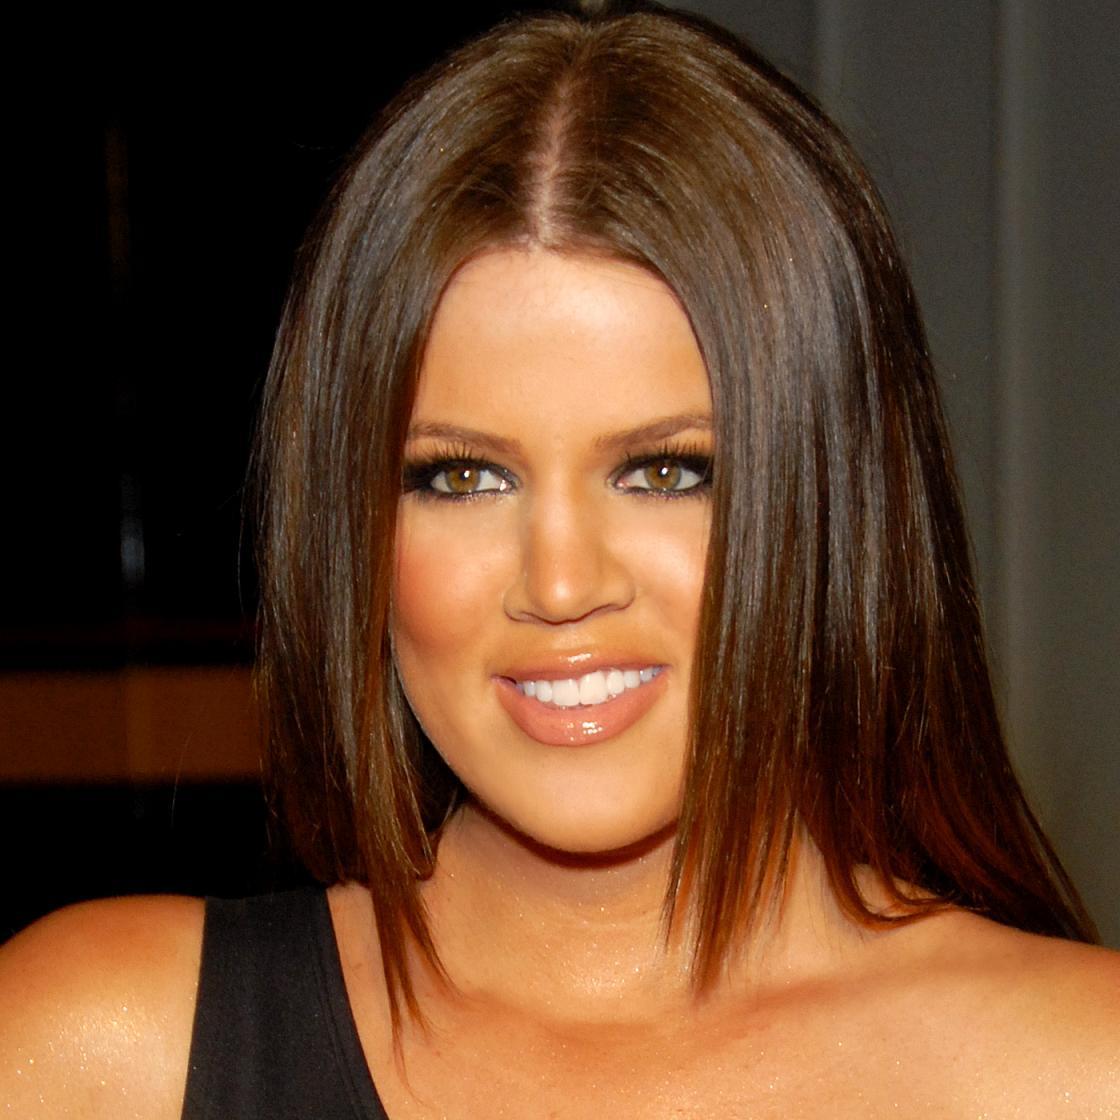 Khloe Kardashian Bio, Net Worth, Facts